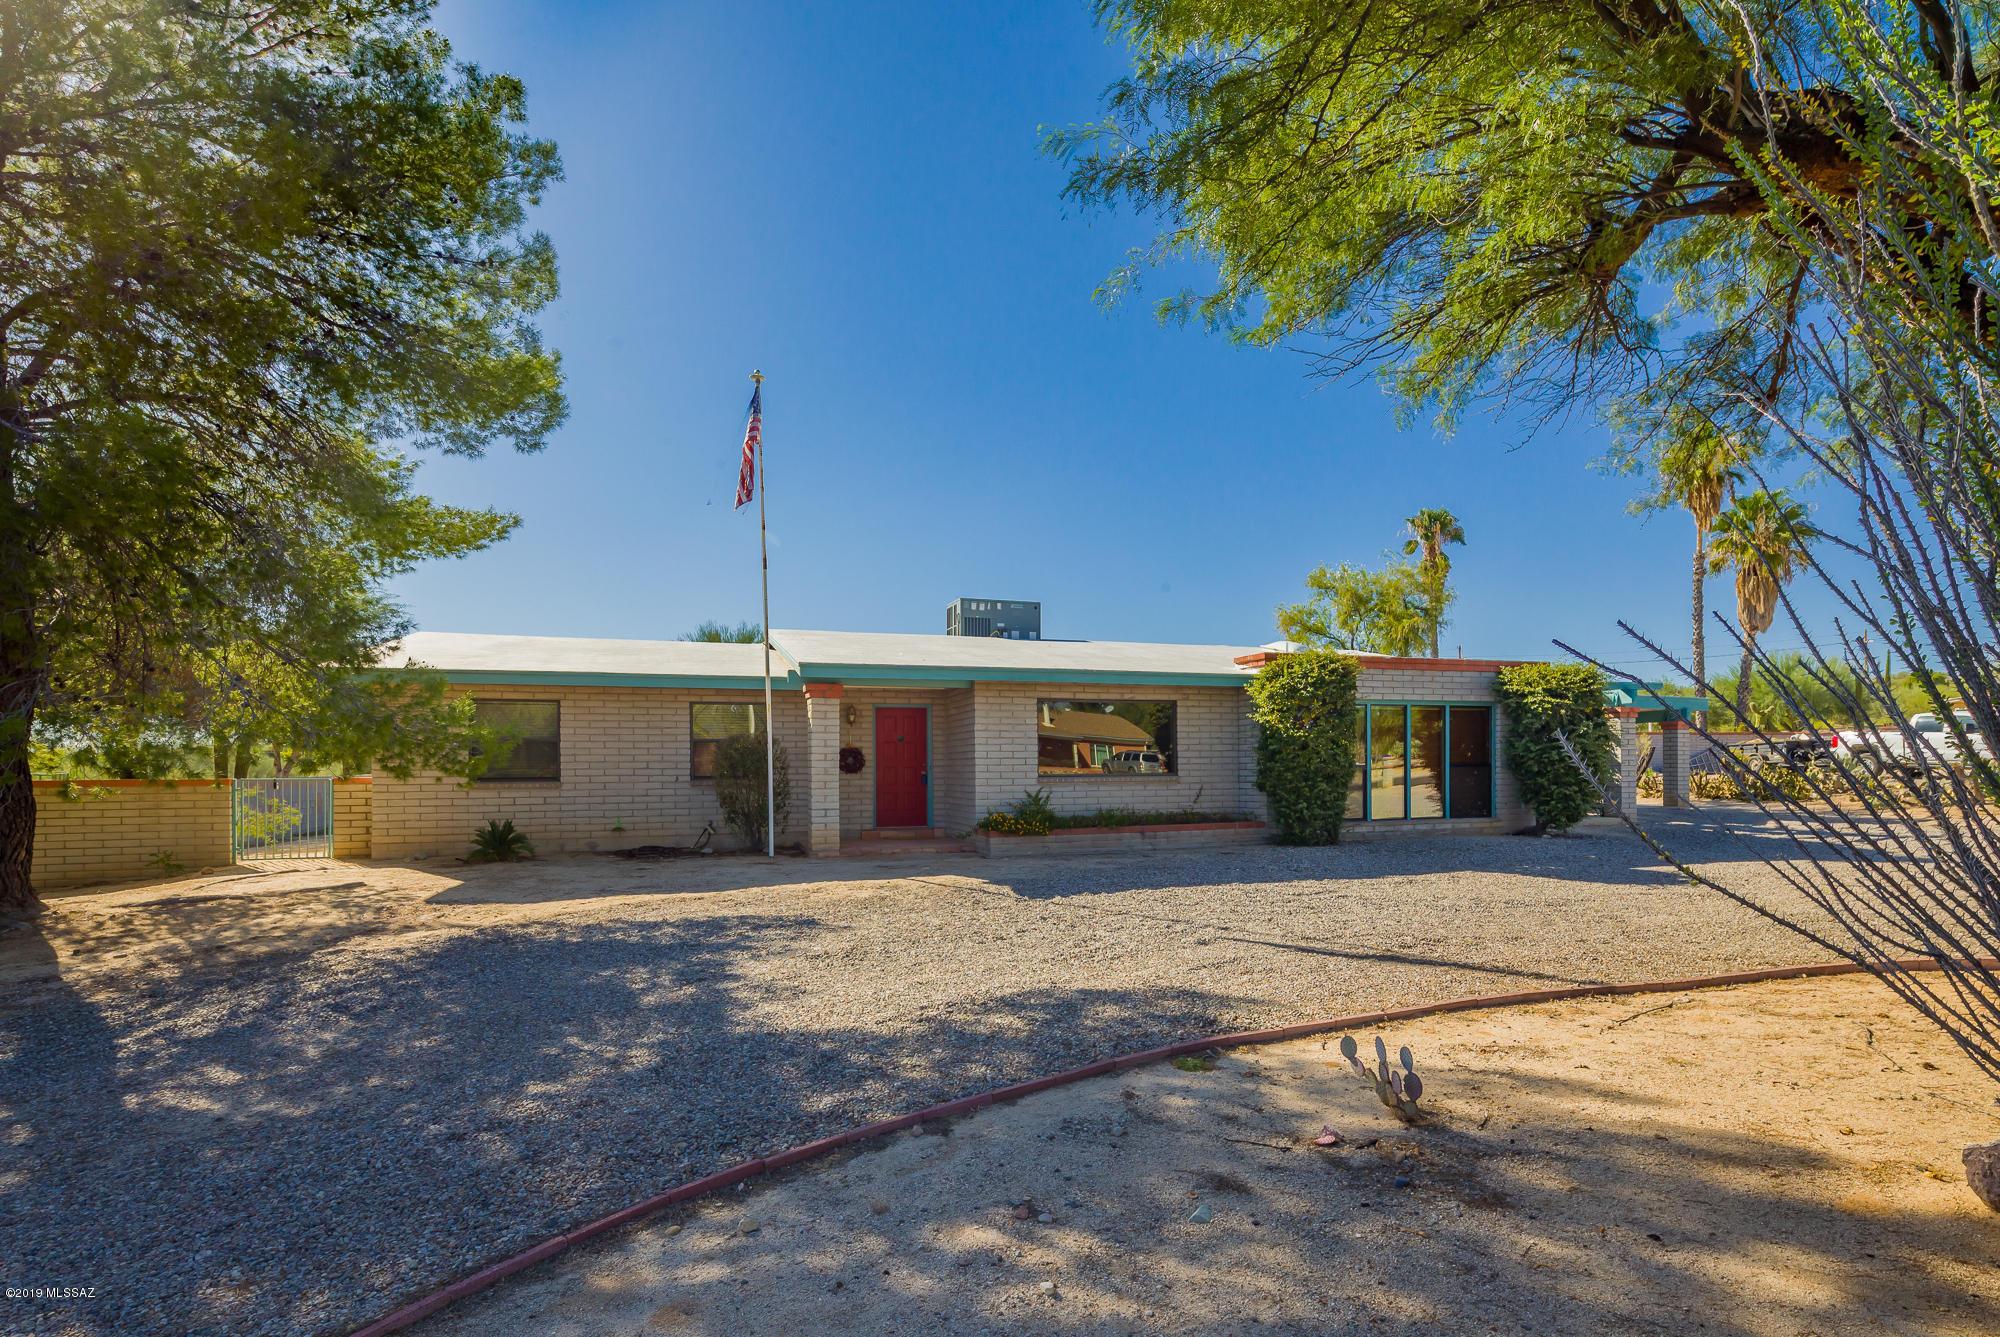 9821 N Calle Solano, Tucson, Arizona